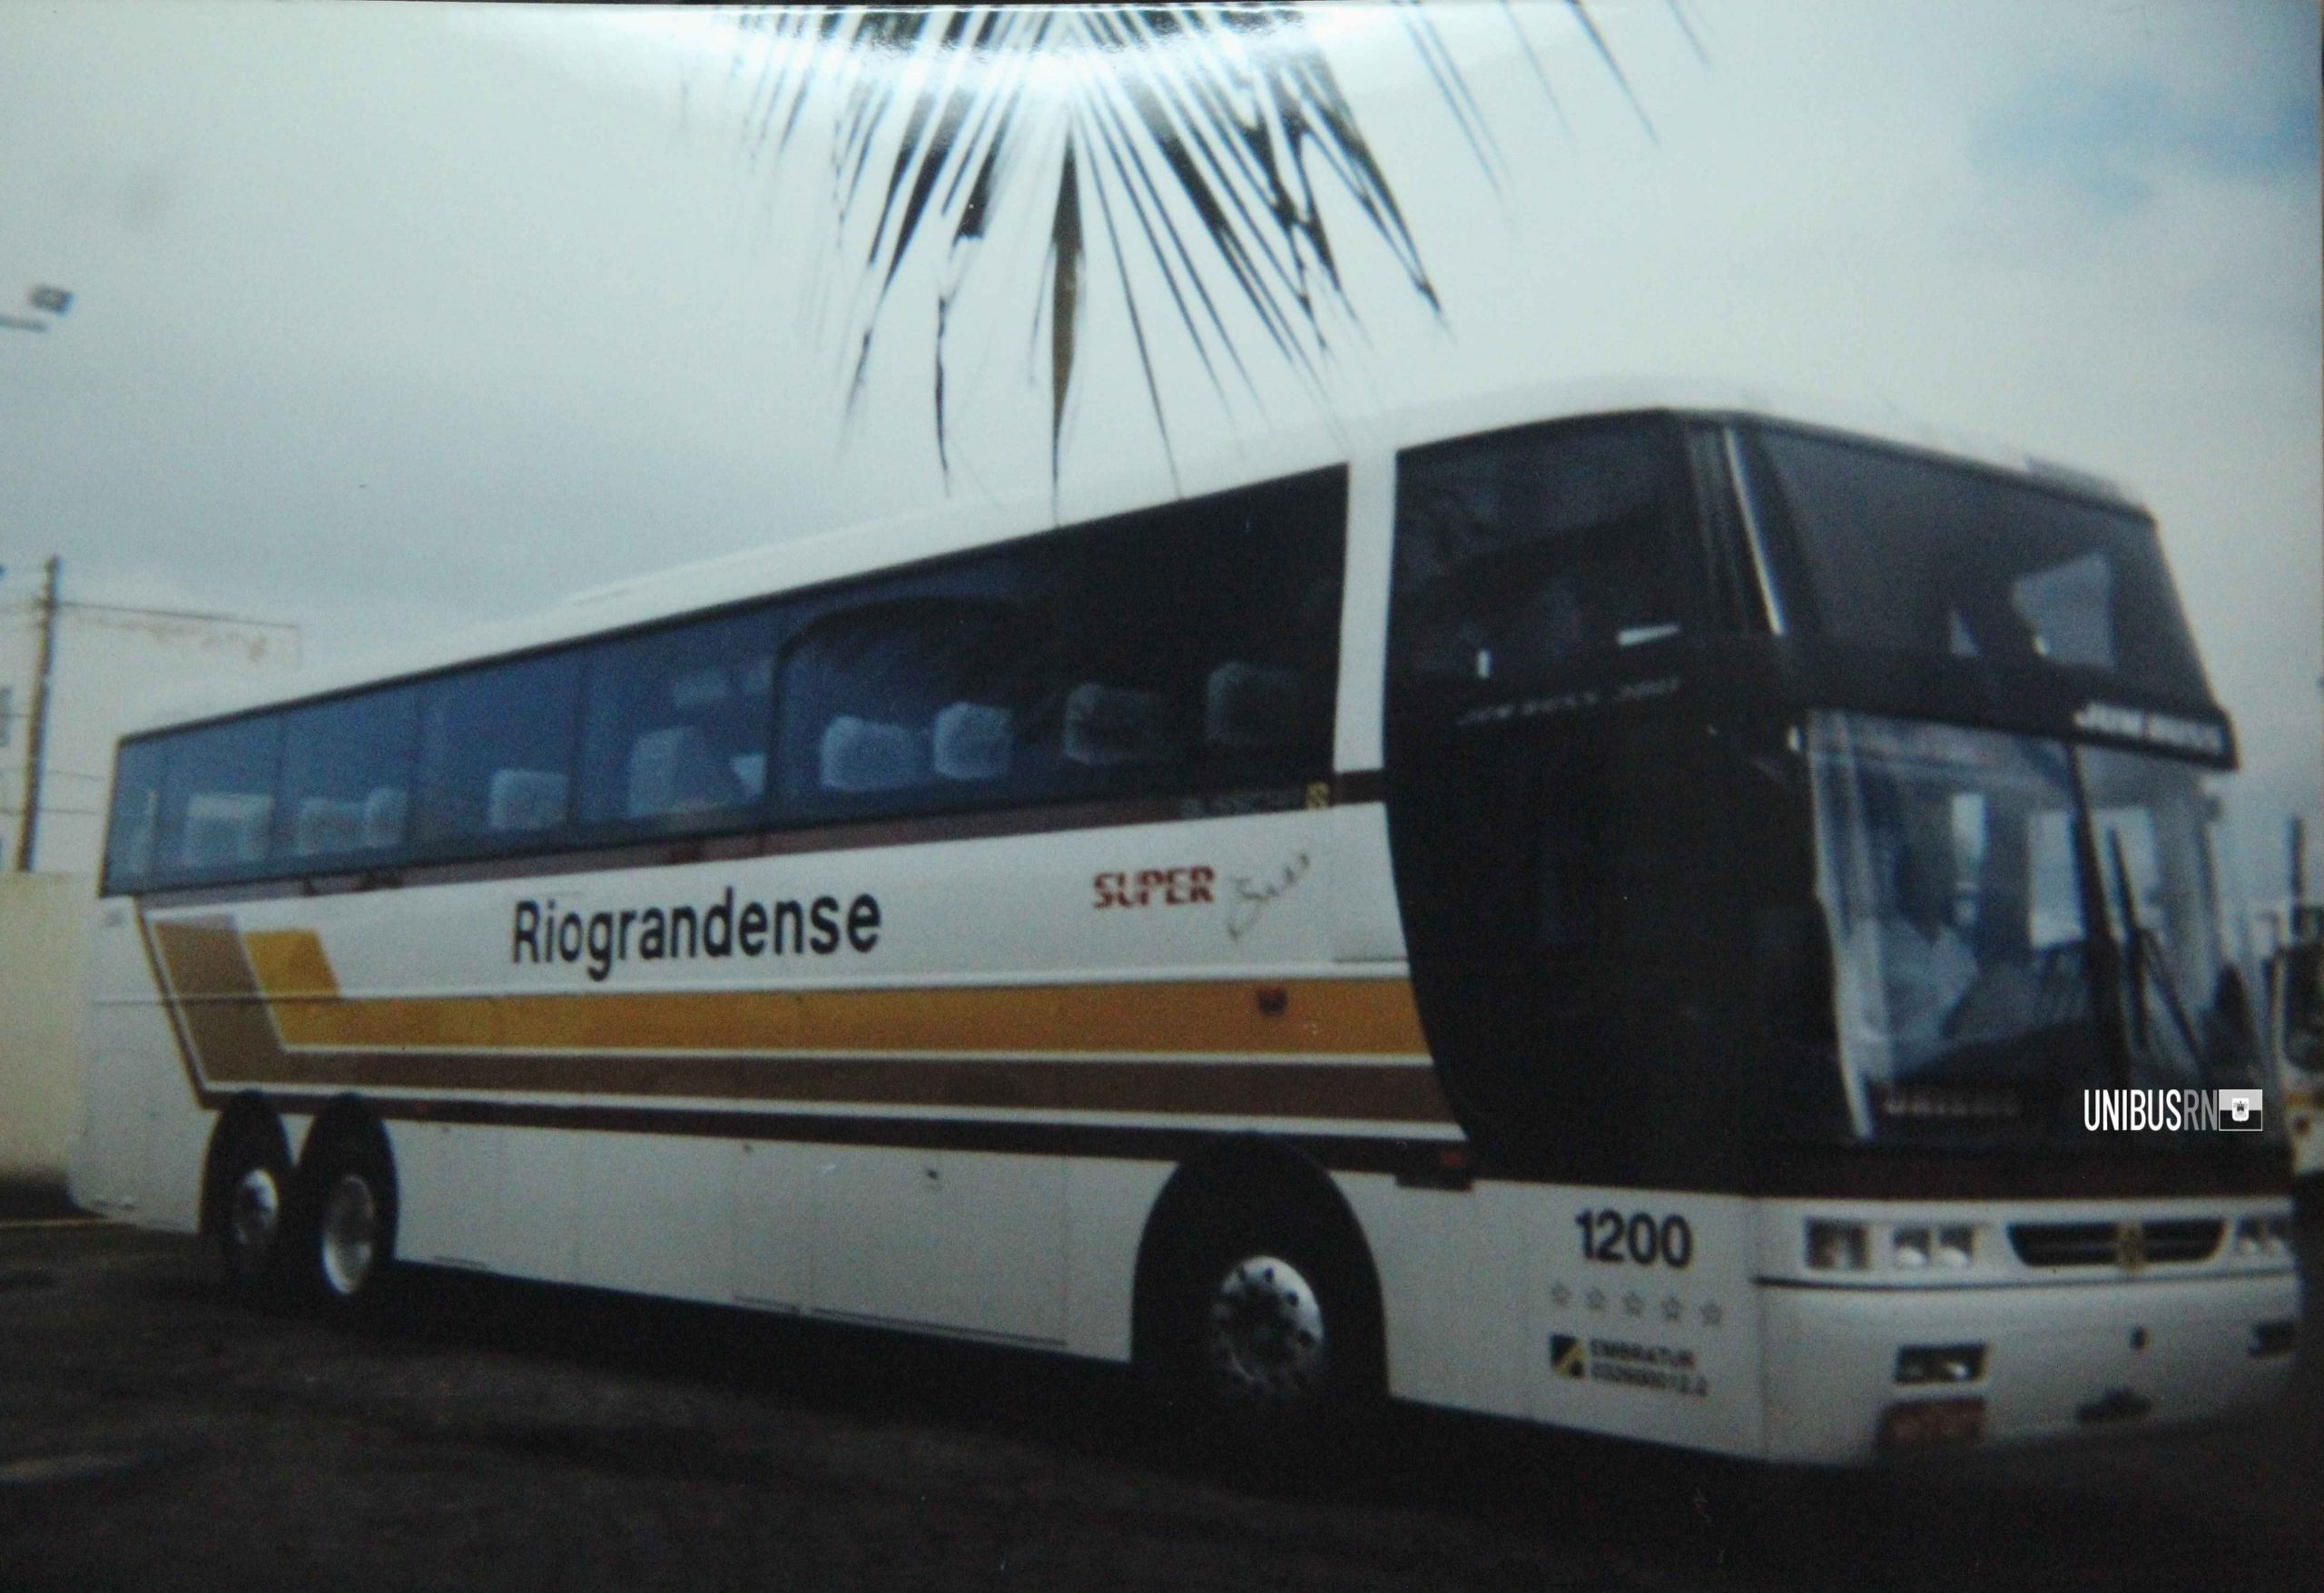 #TBT UNIBUS RN: Riograndense, 1110 e 1200